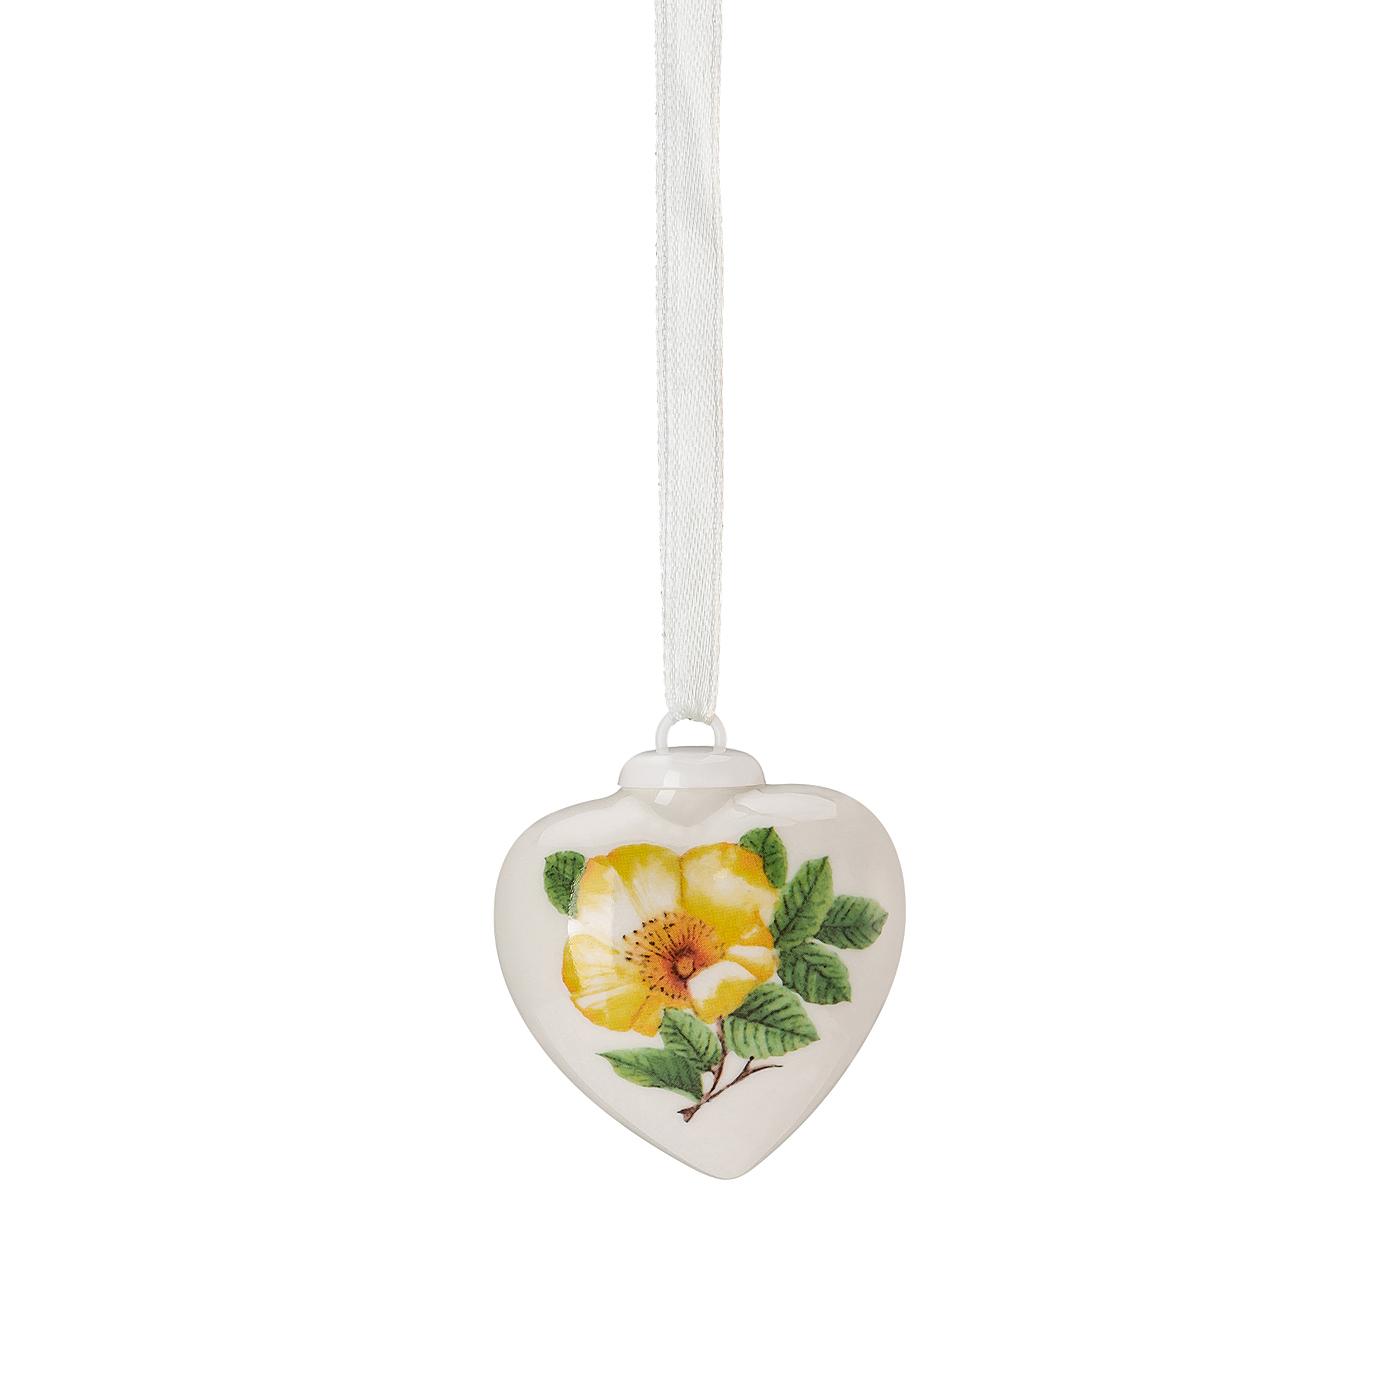 Porzellan-Mini-Herz Frühlingsgrüsse Heckenrose - gelb Hutschenreuther